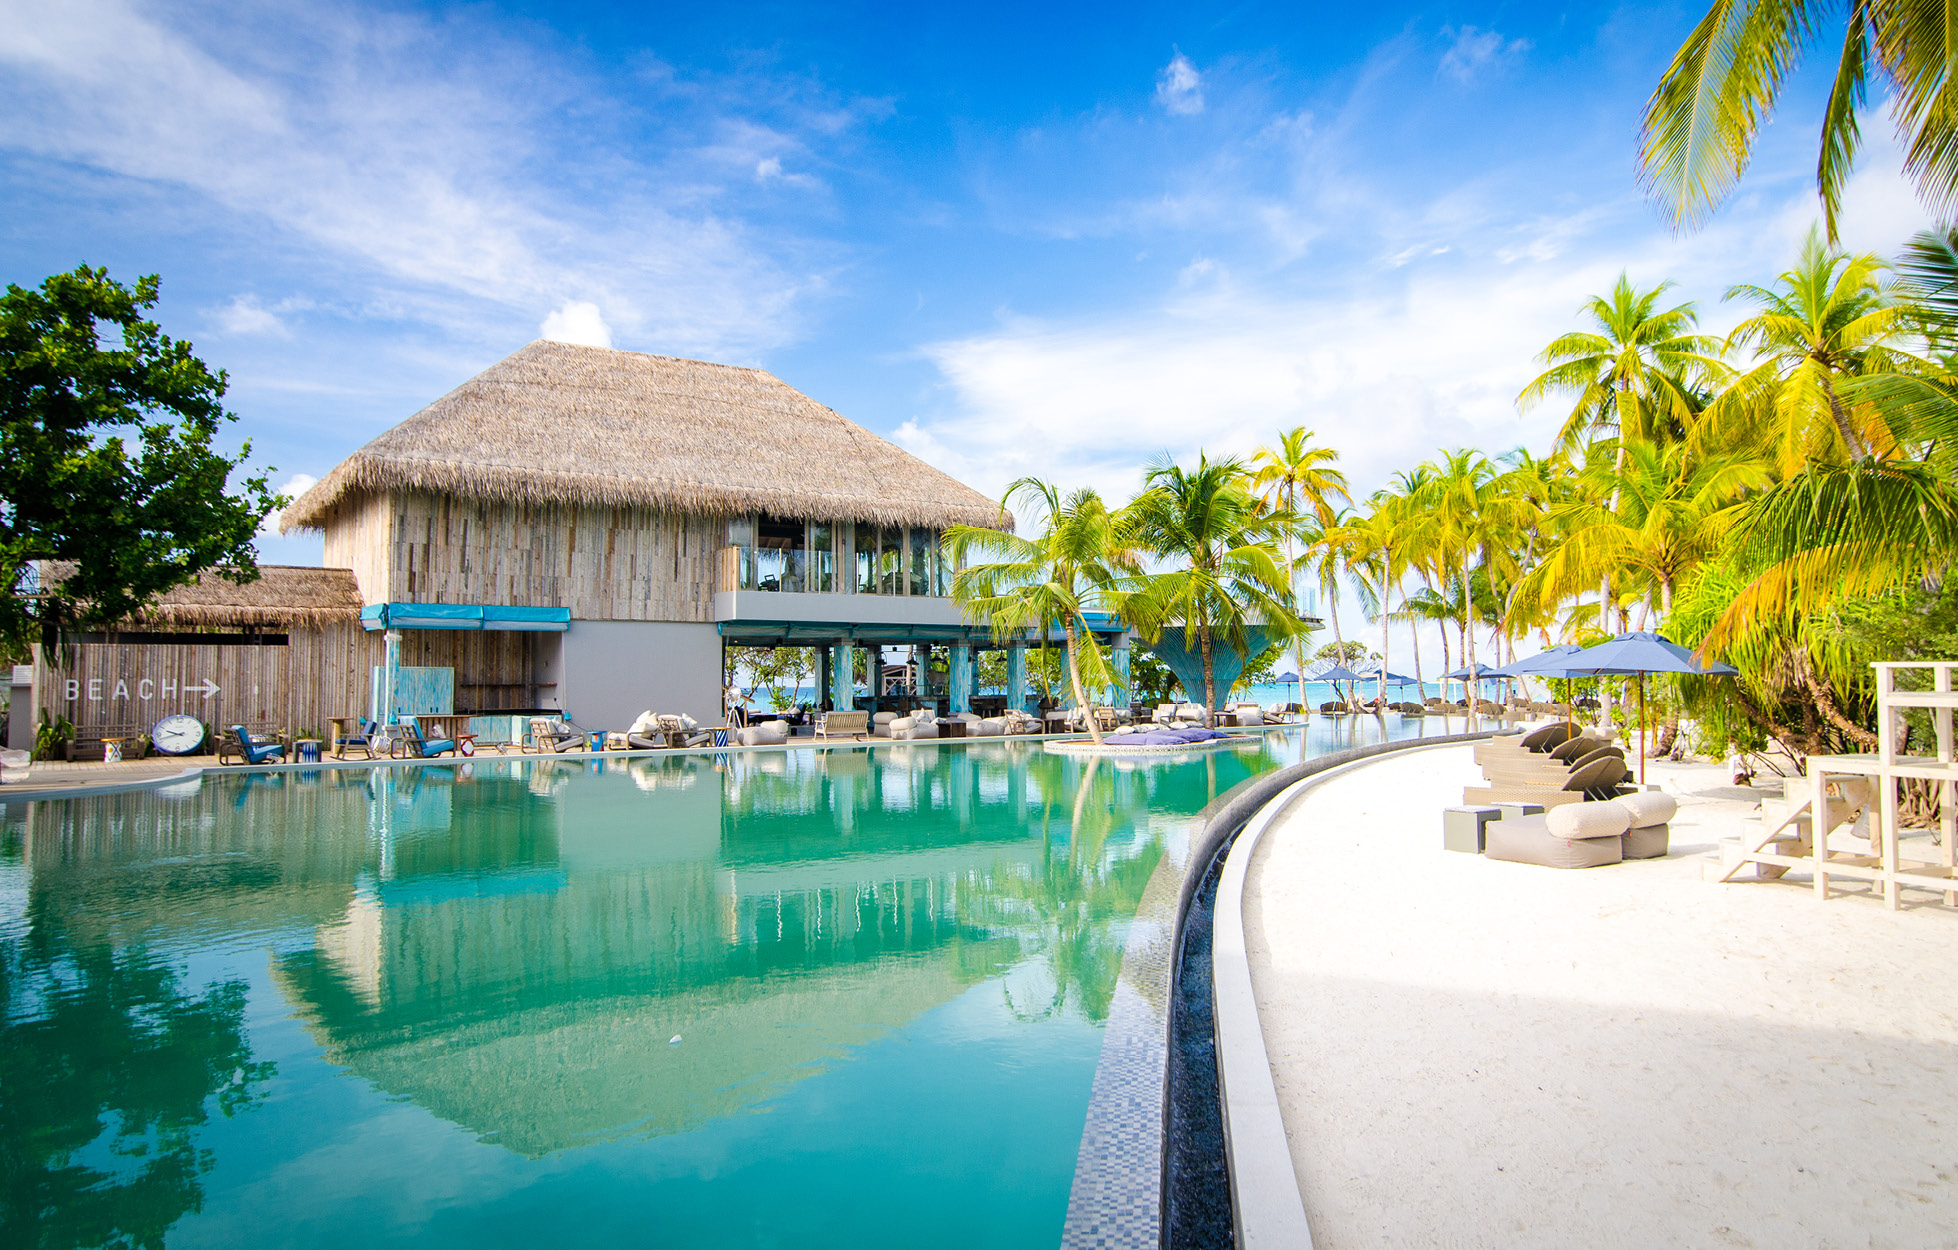 baa-bar-pool-finolhu-maldives